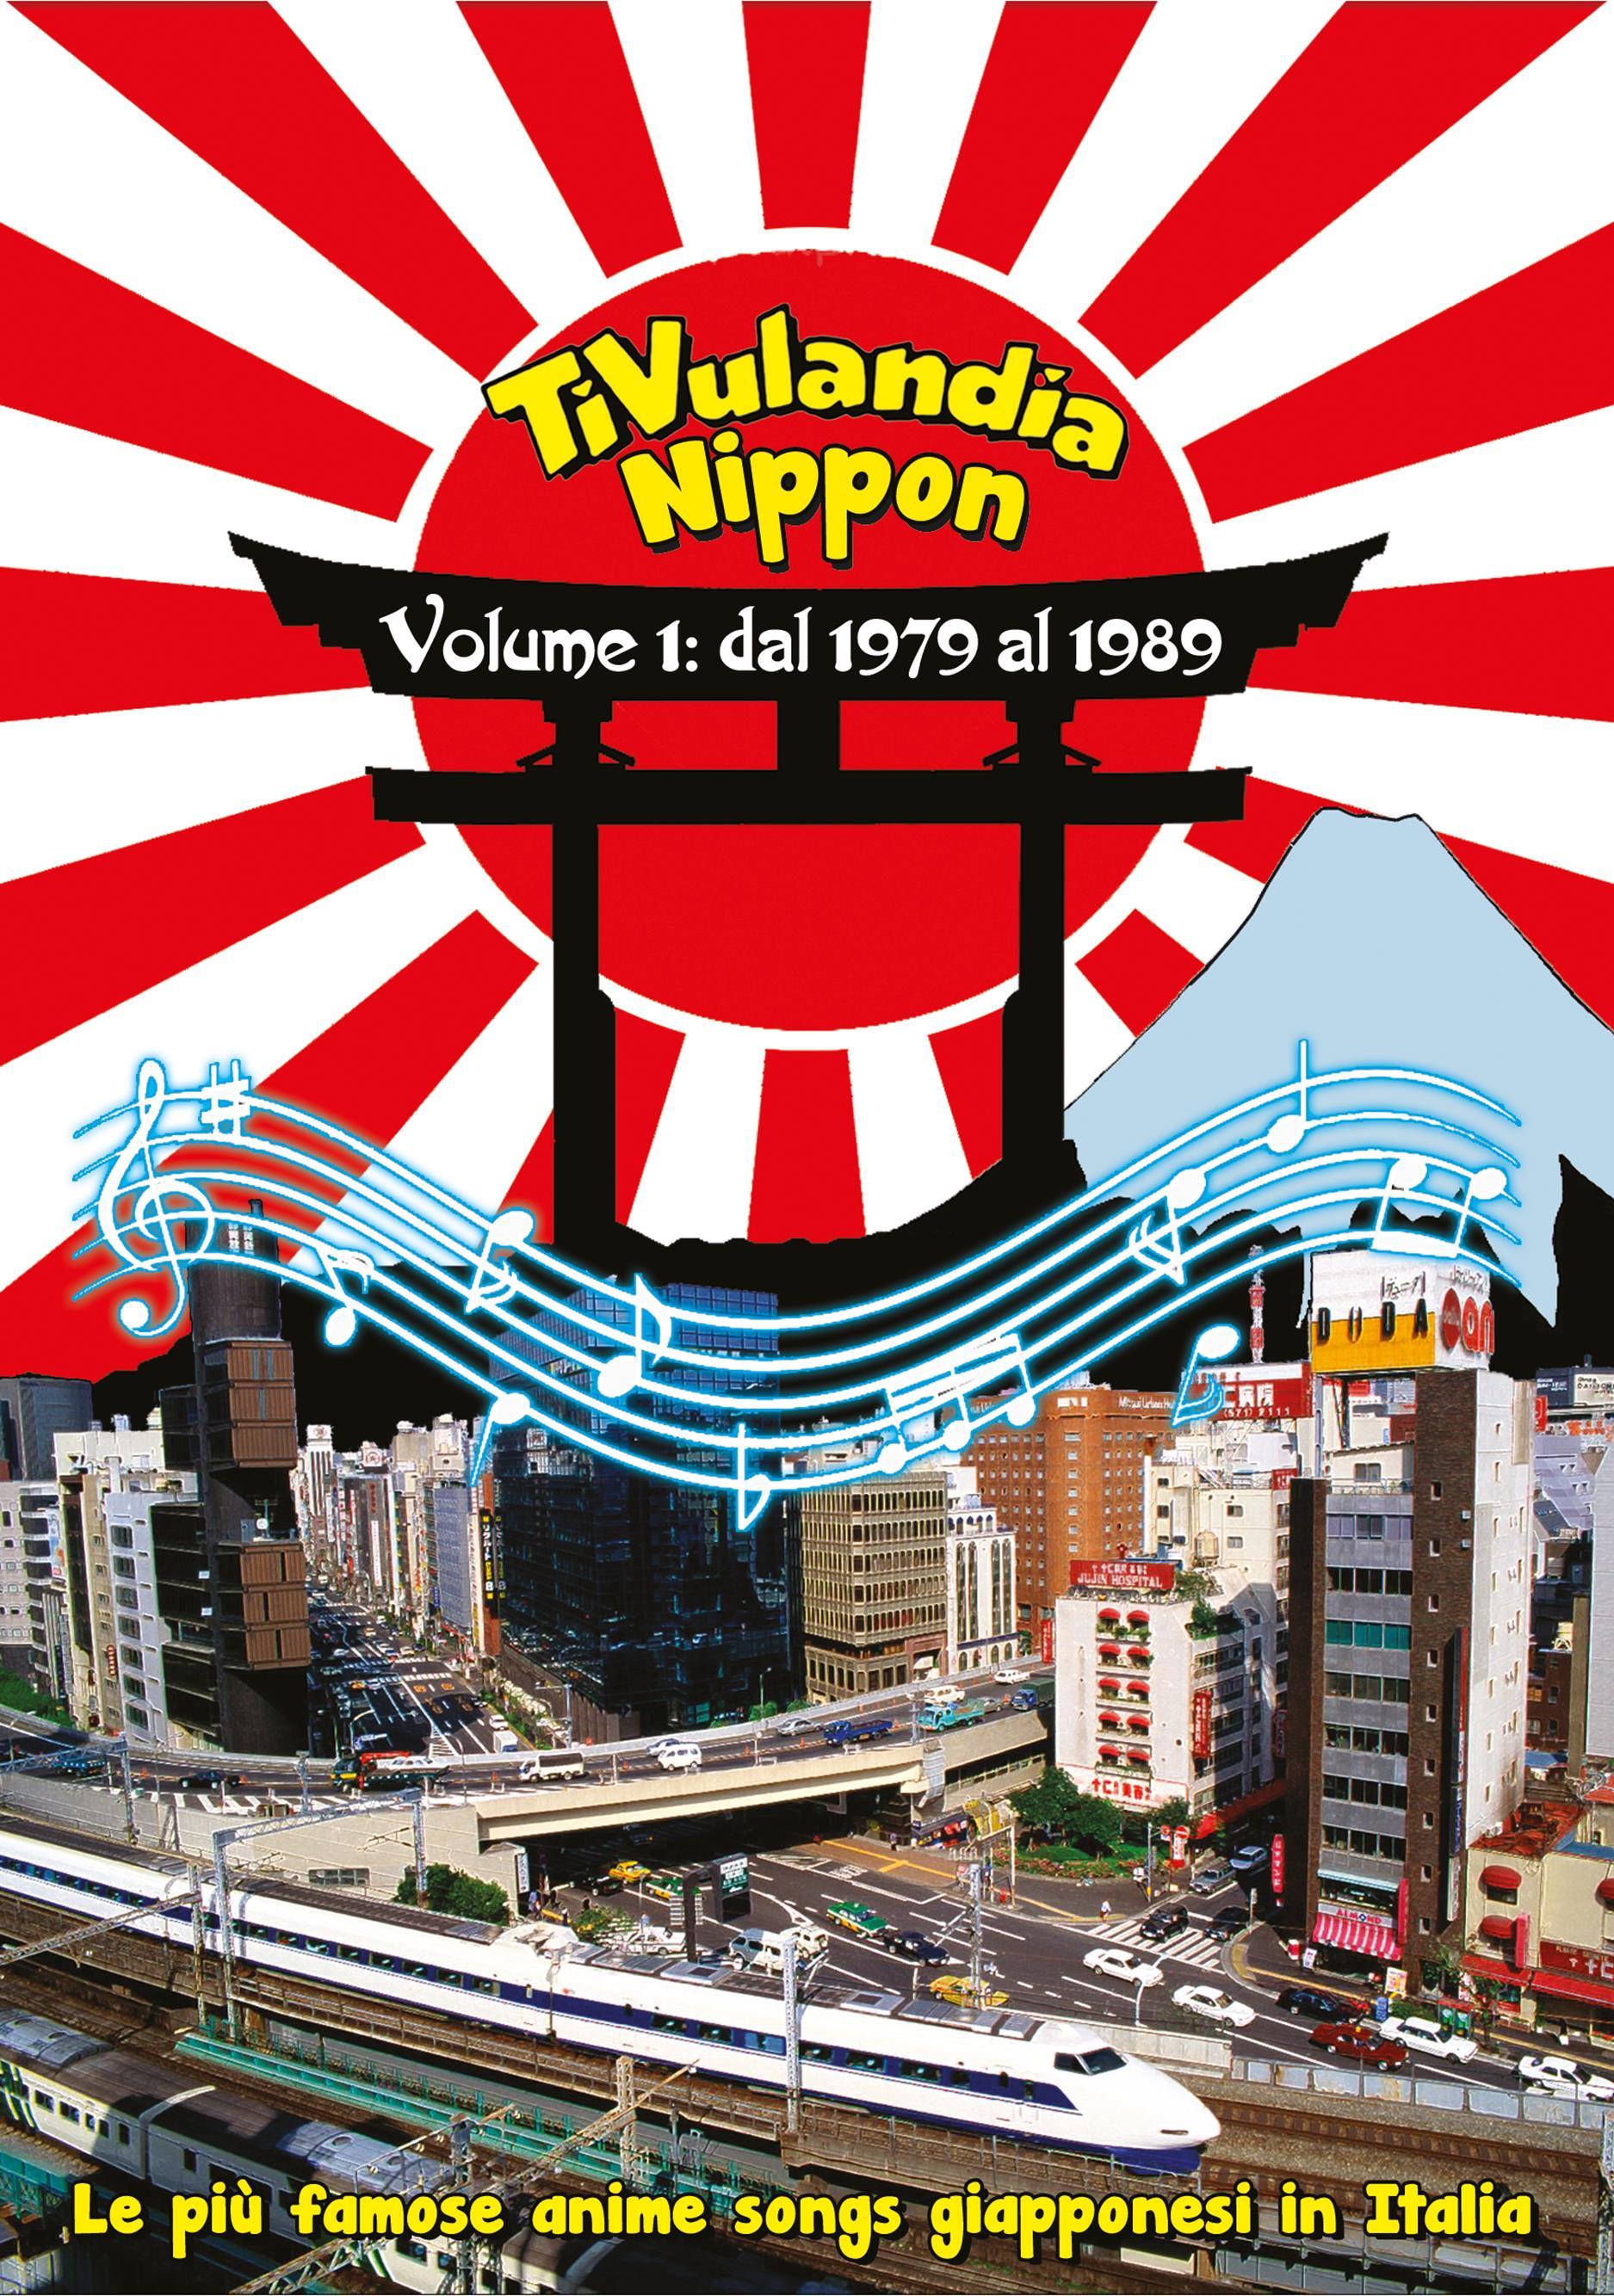 Tivulandia Nippon volume 1